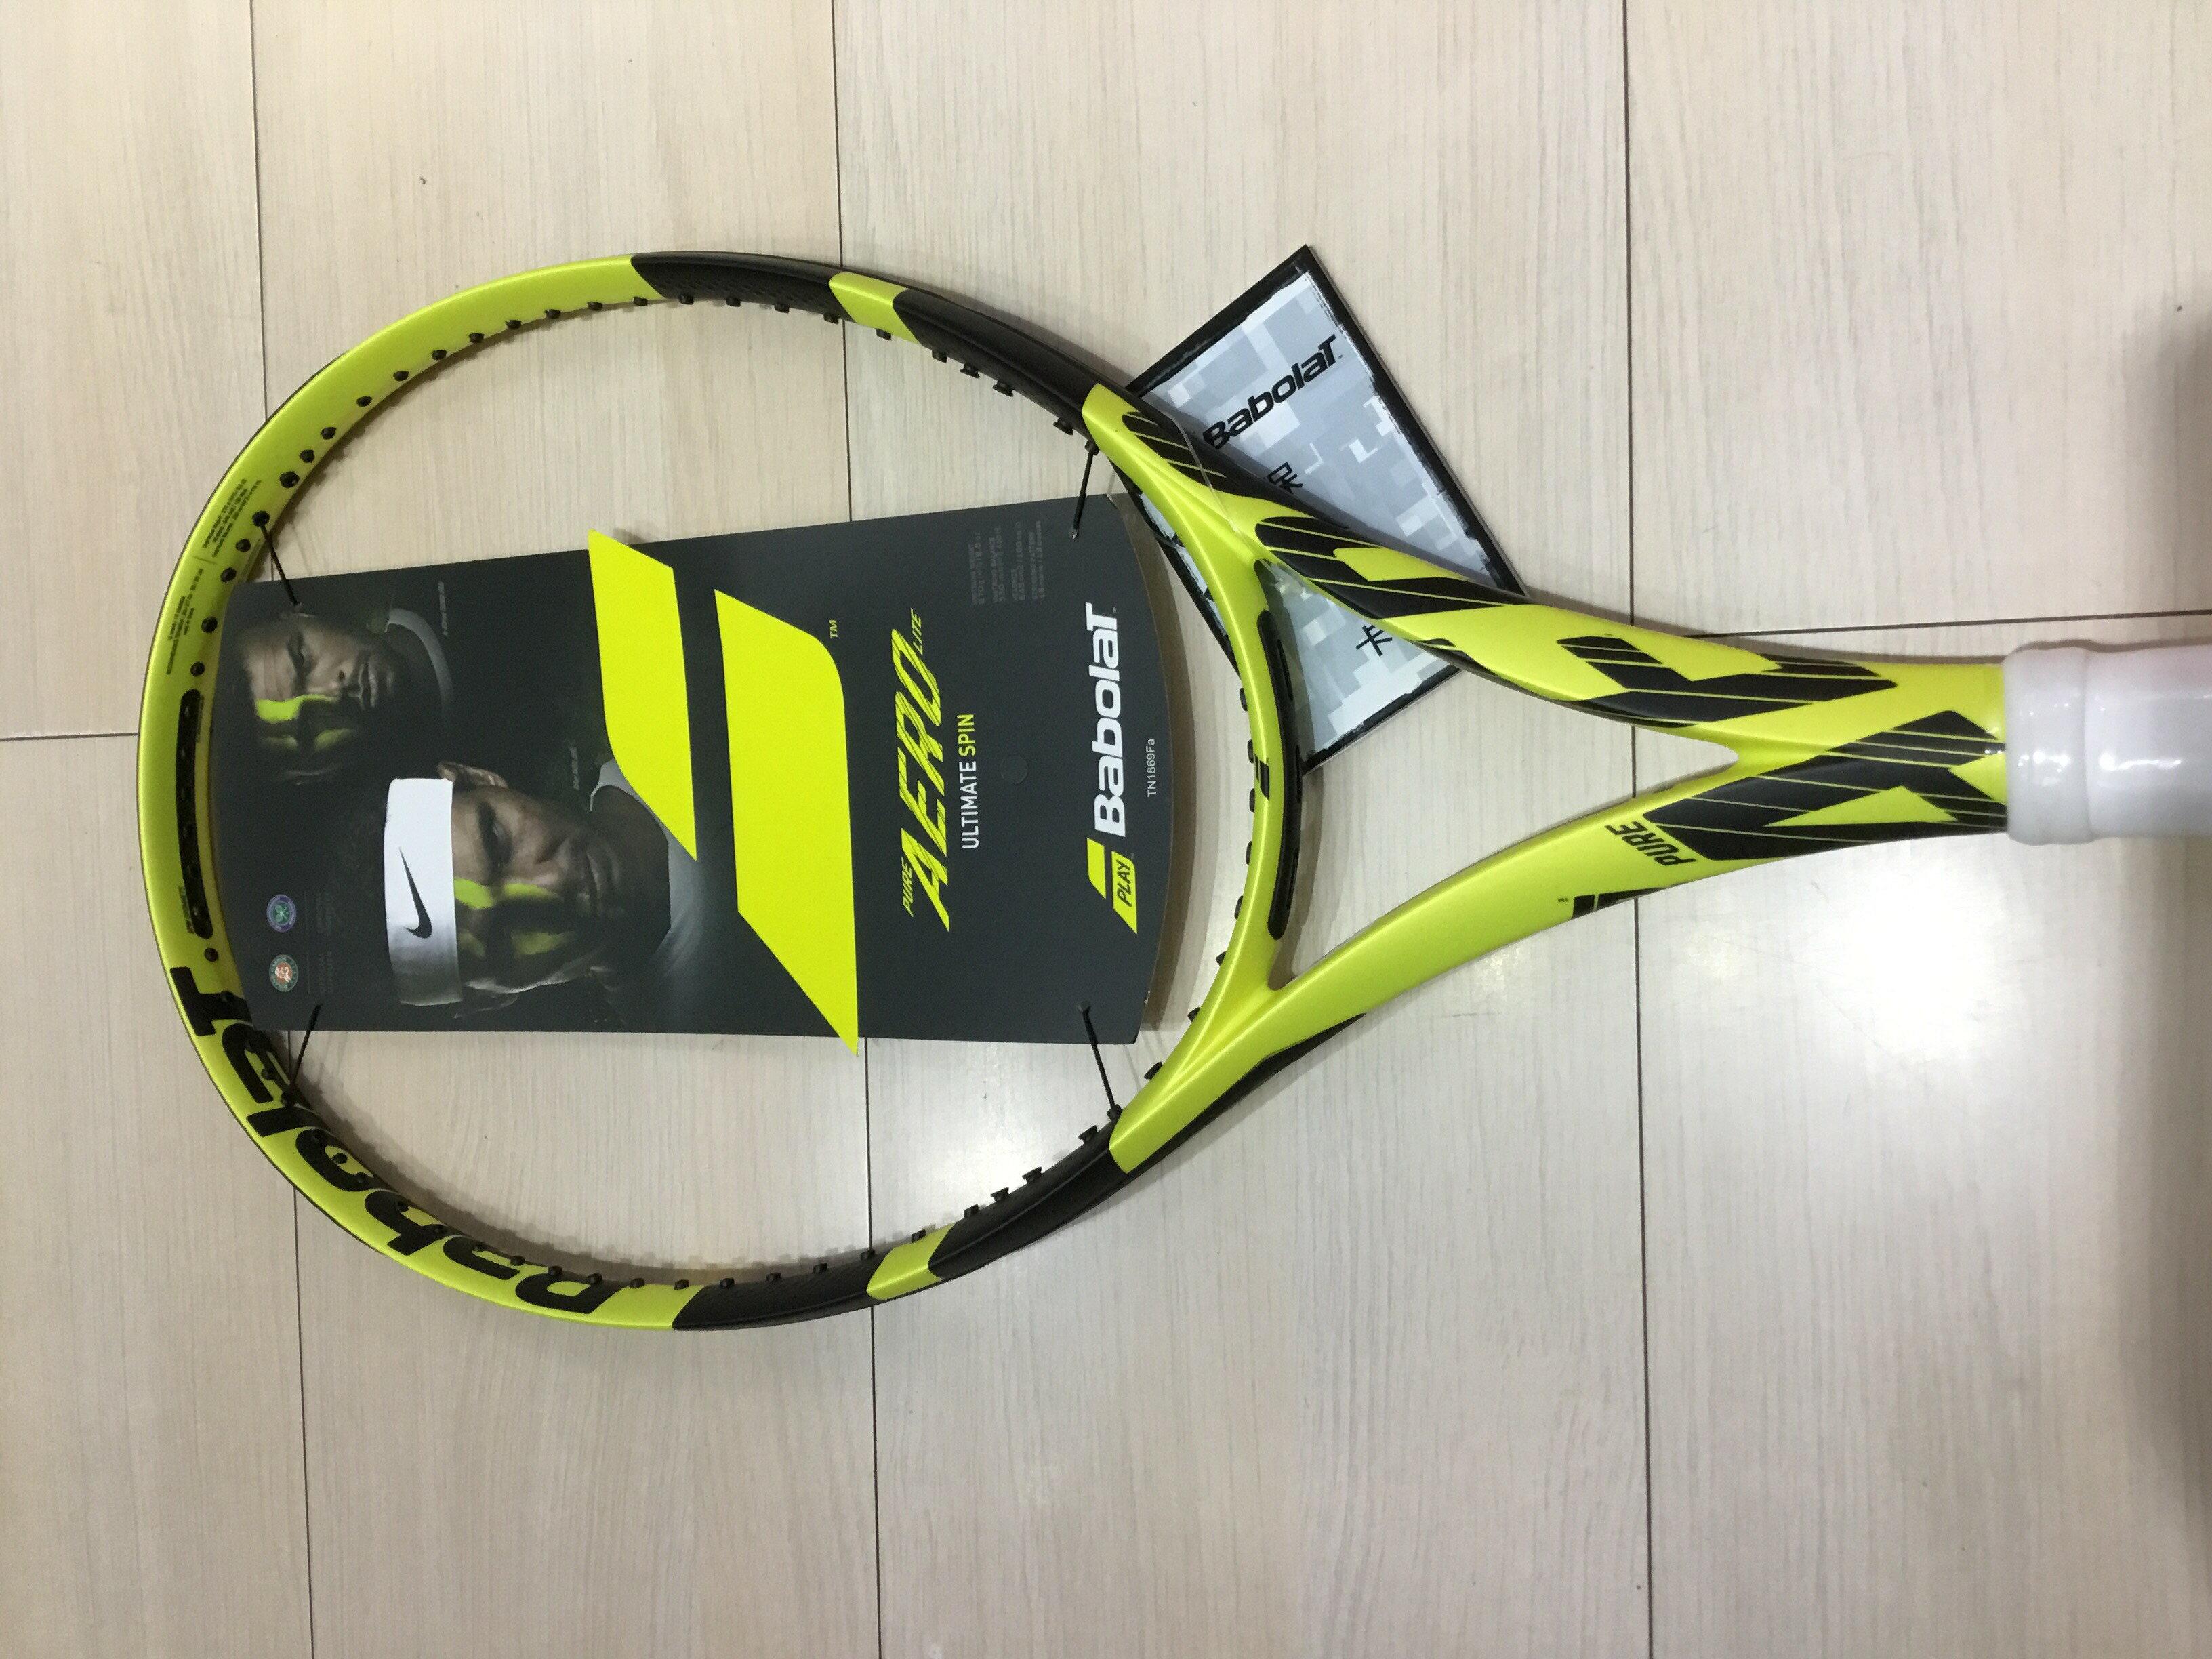 2018 Babolat Pure Aero Lite專業網球拍